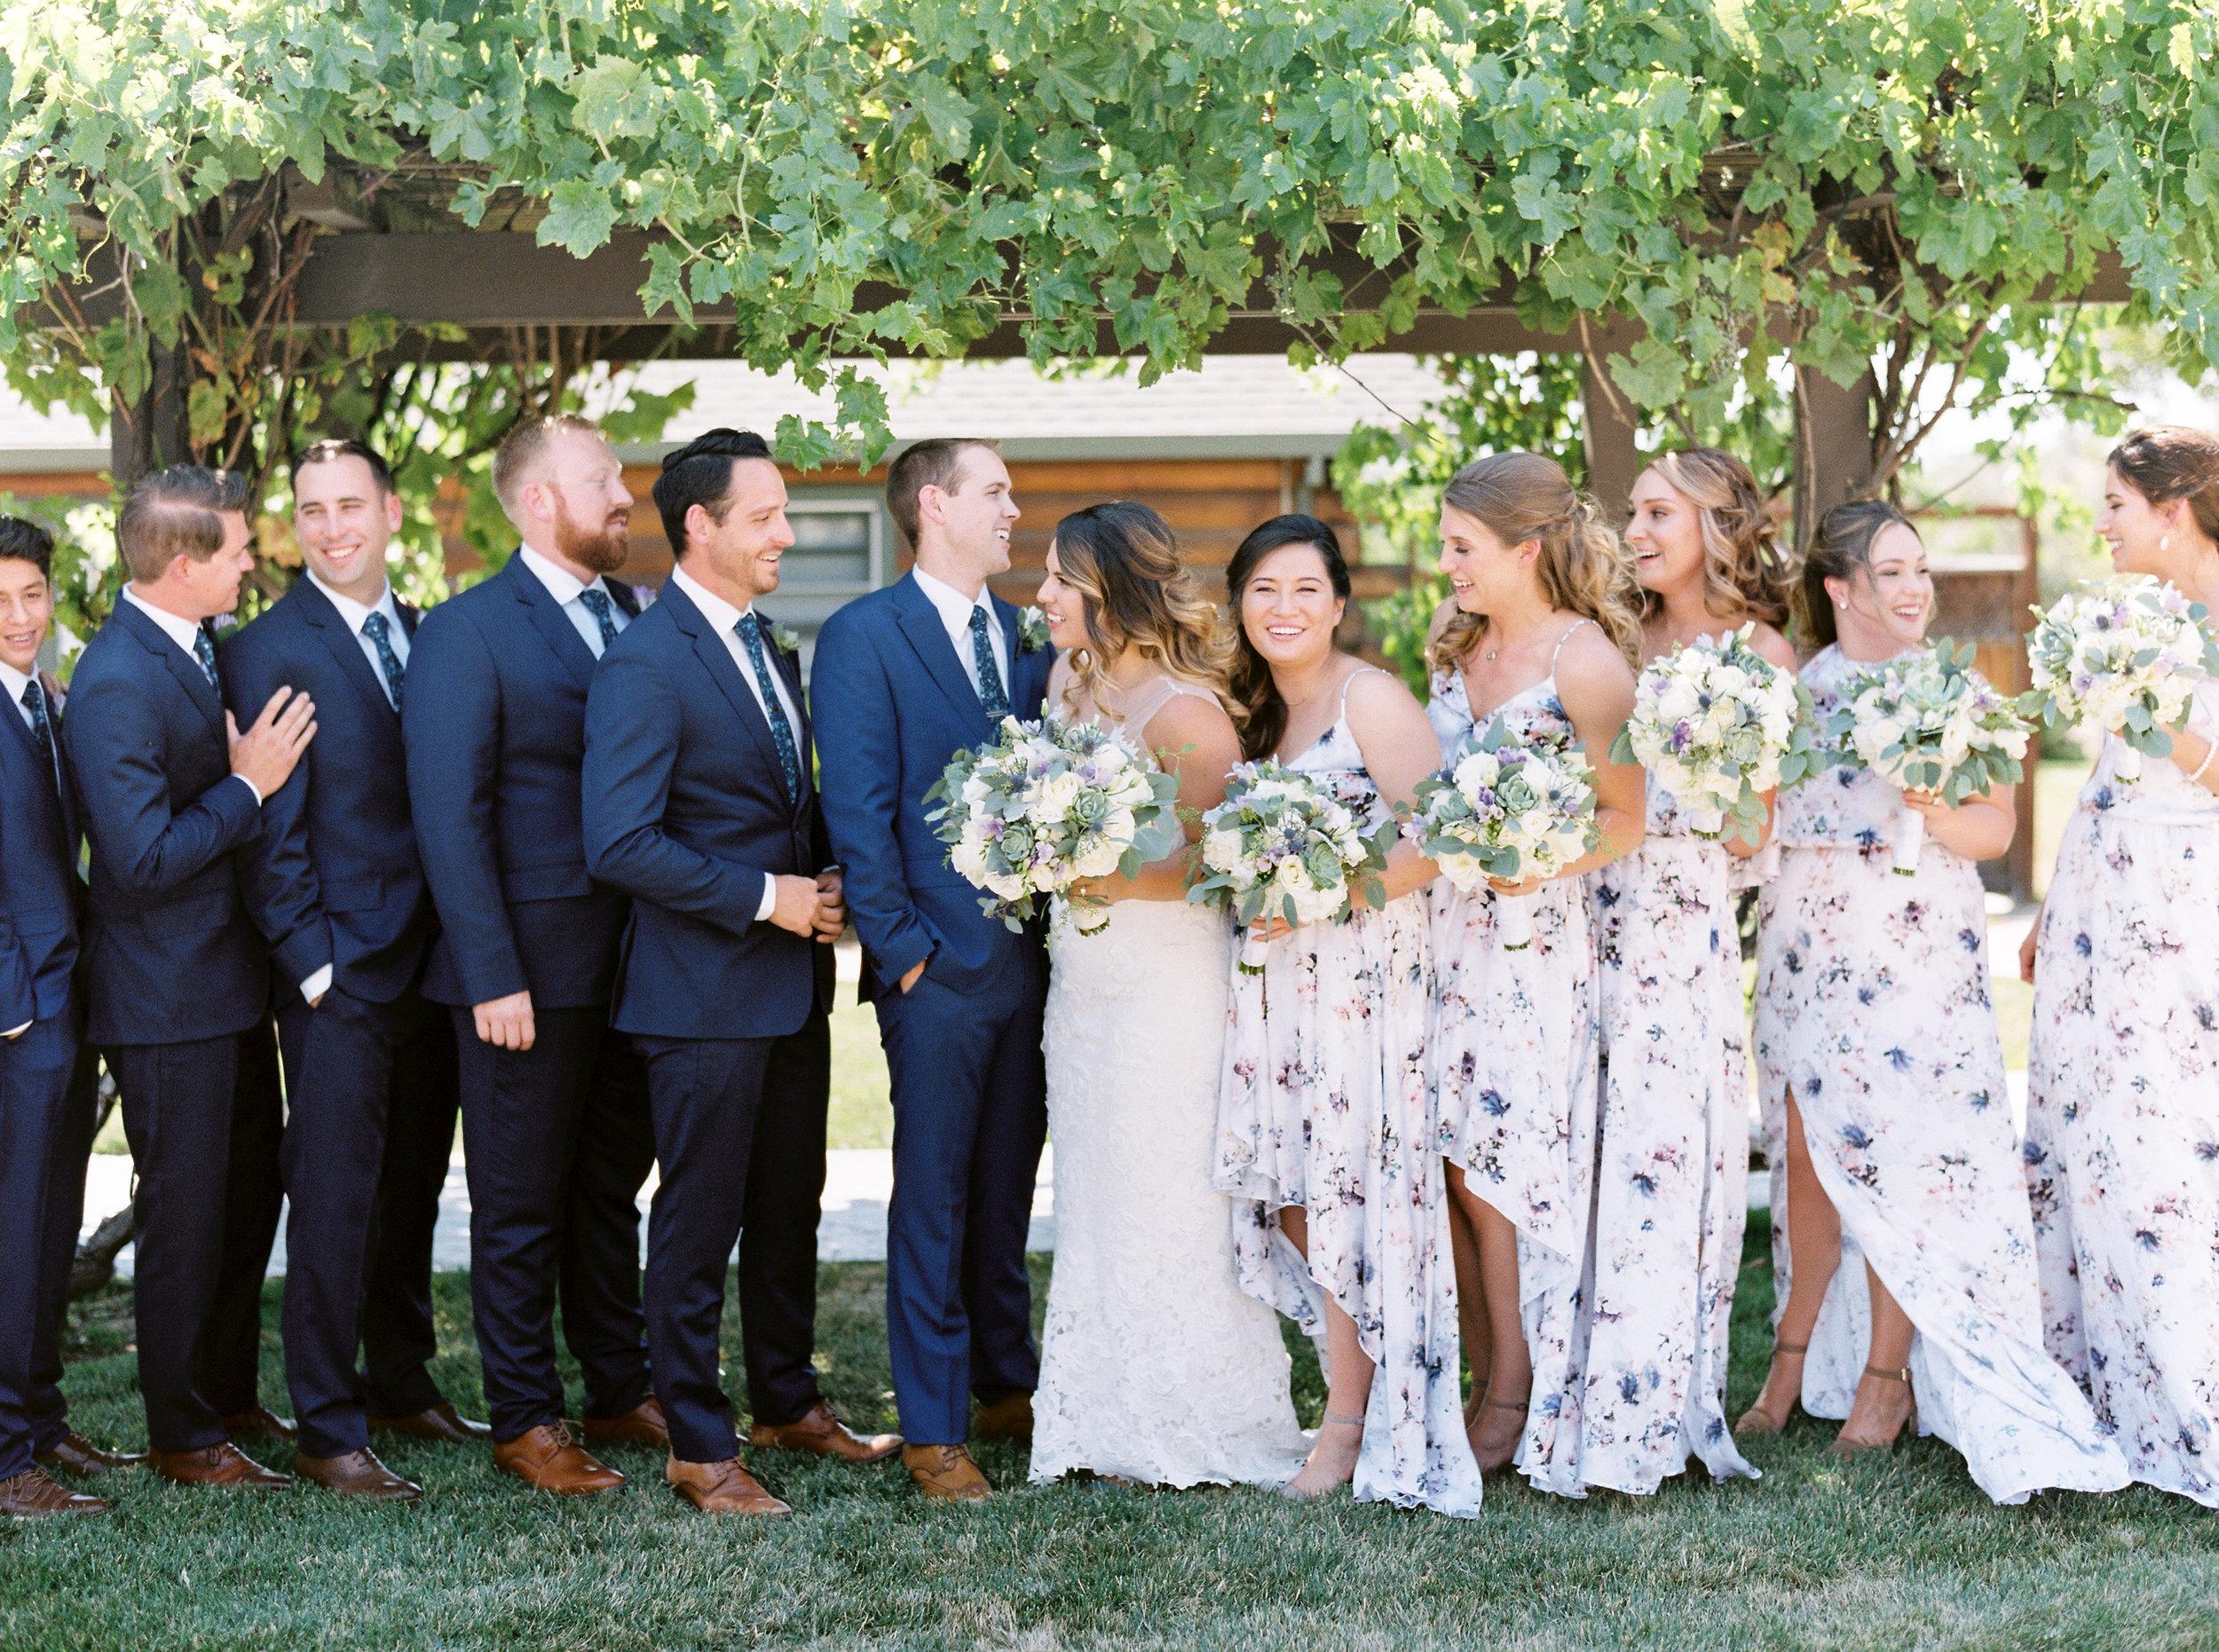 the-purple-orchid-resort-wedding-in-livermore-california-216.jpg